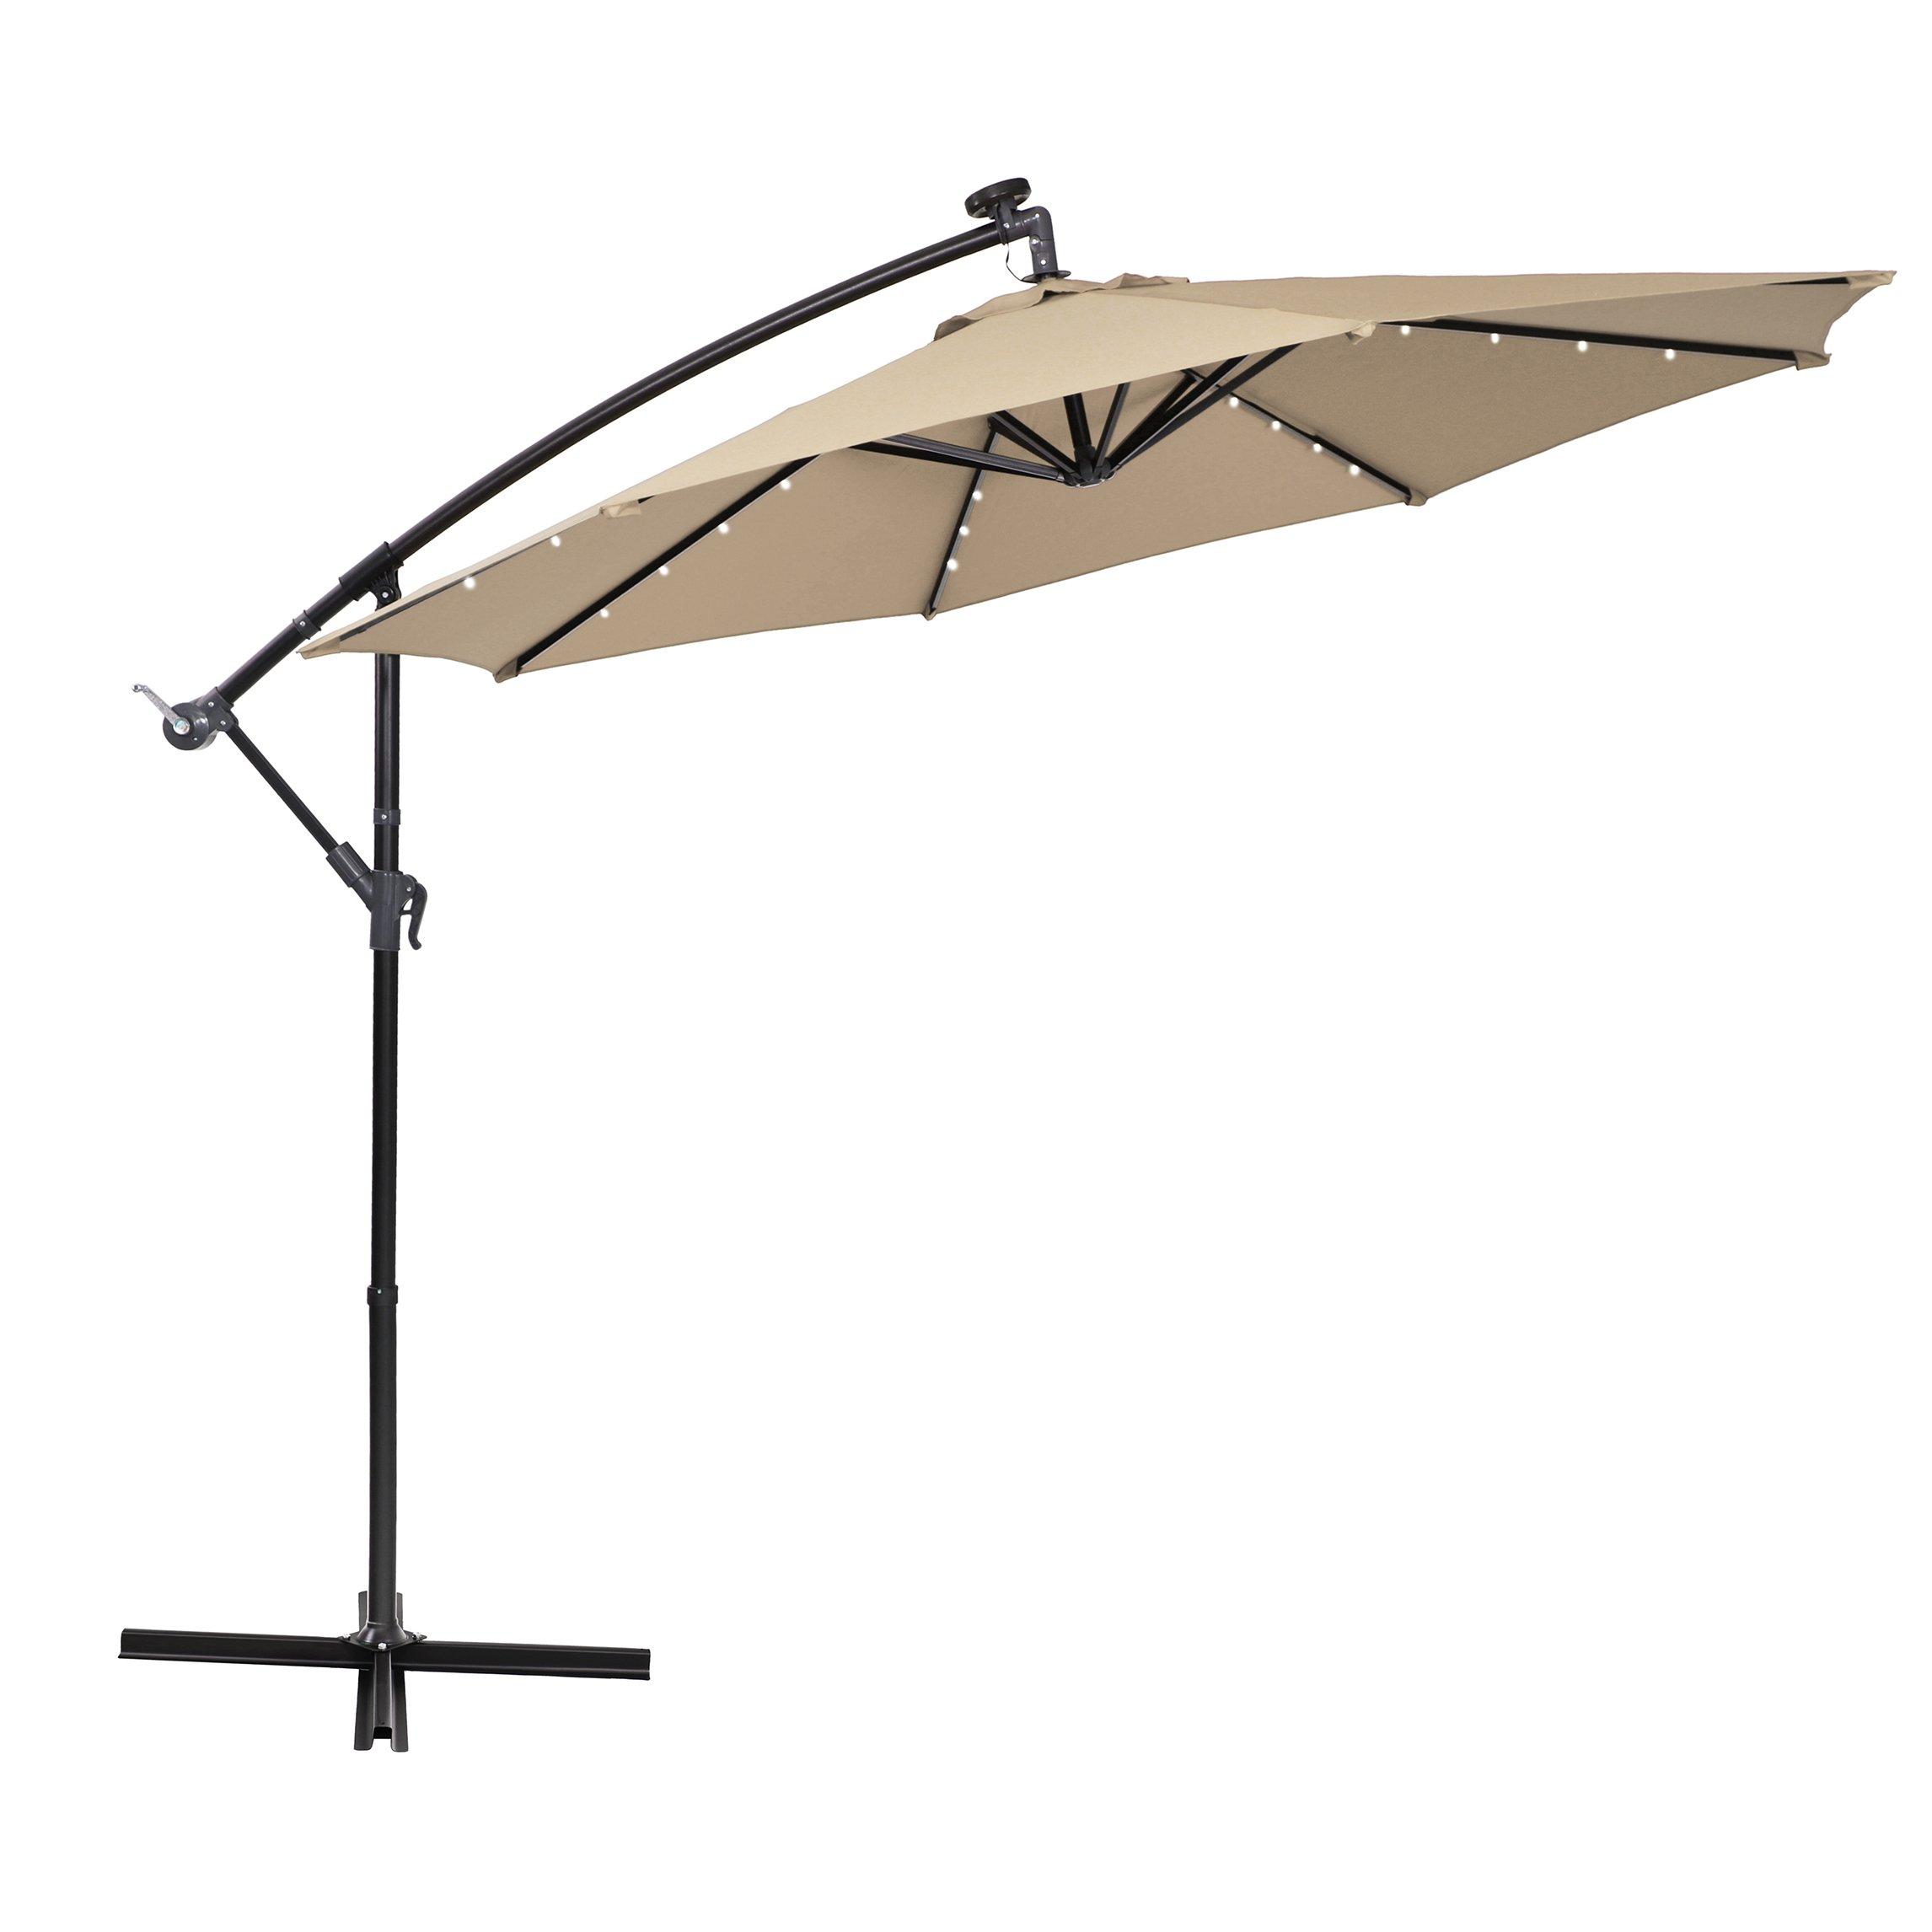 PHI VILLA 10ft Offset Hanging Umbrella with 32 PCS LED Lights Solar Powered Patio Umbrella with Crossbase, 8 Ribs, Beige